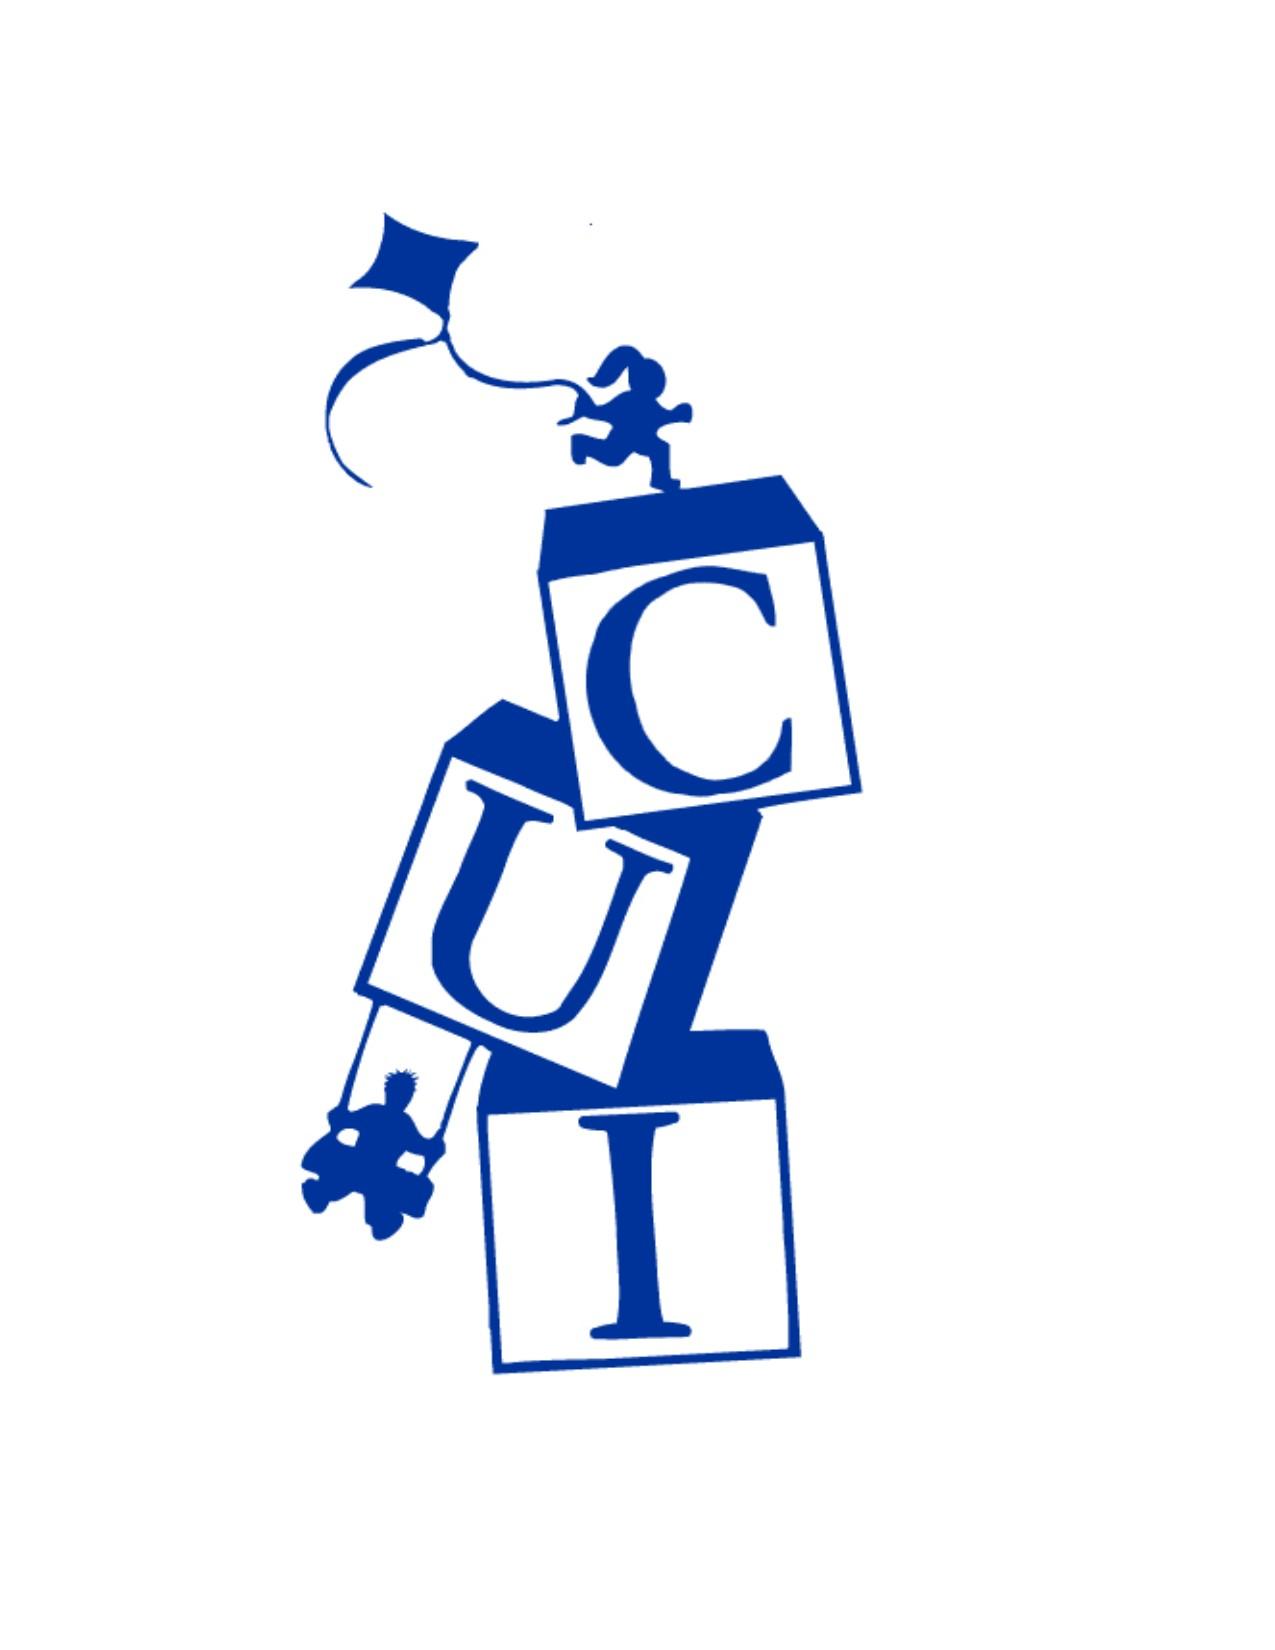 Communities United, Inc. logo